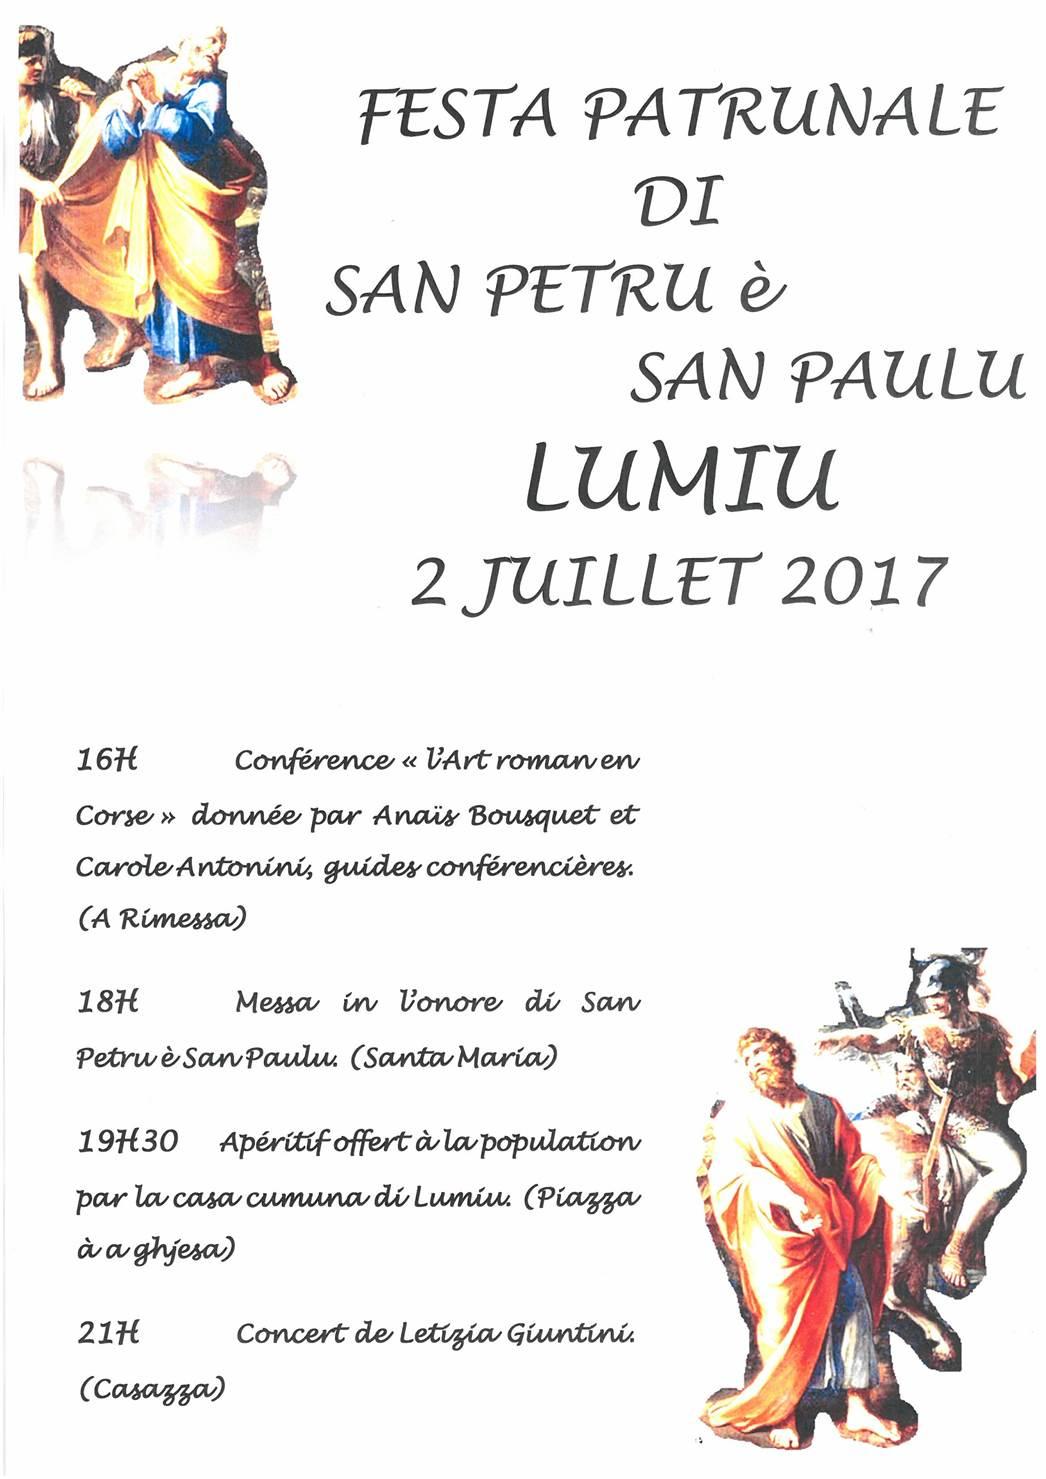 Festa di San Petru è San Paulu le 2 juillet 2017